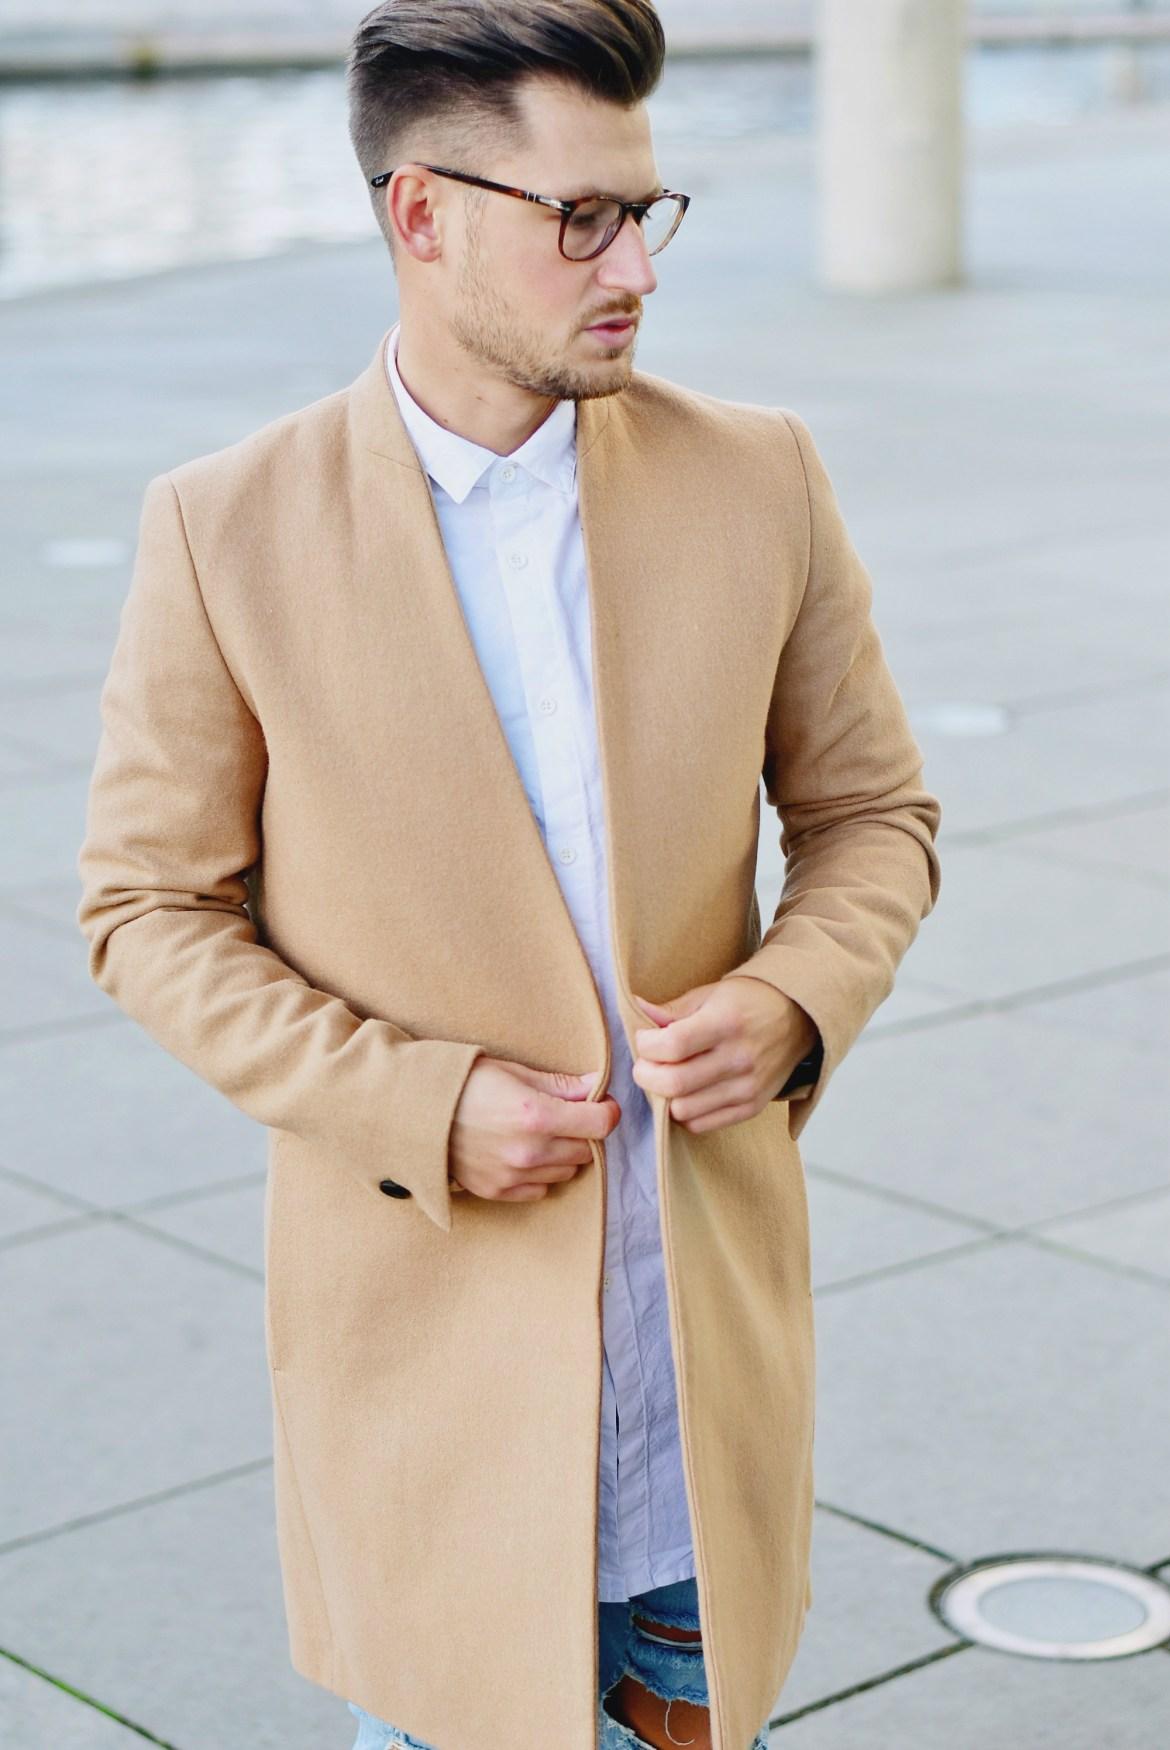 Tommeezjerry-Styleblog-Männerblog-Modeblog-Berlin-Asos-Mantel-Camel-Coat-Outfit-Männermode-Streetwear